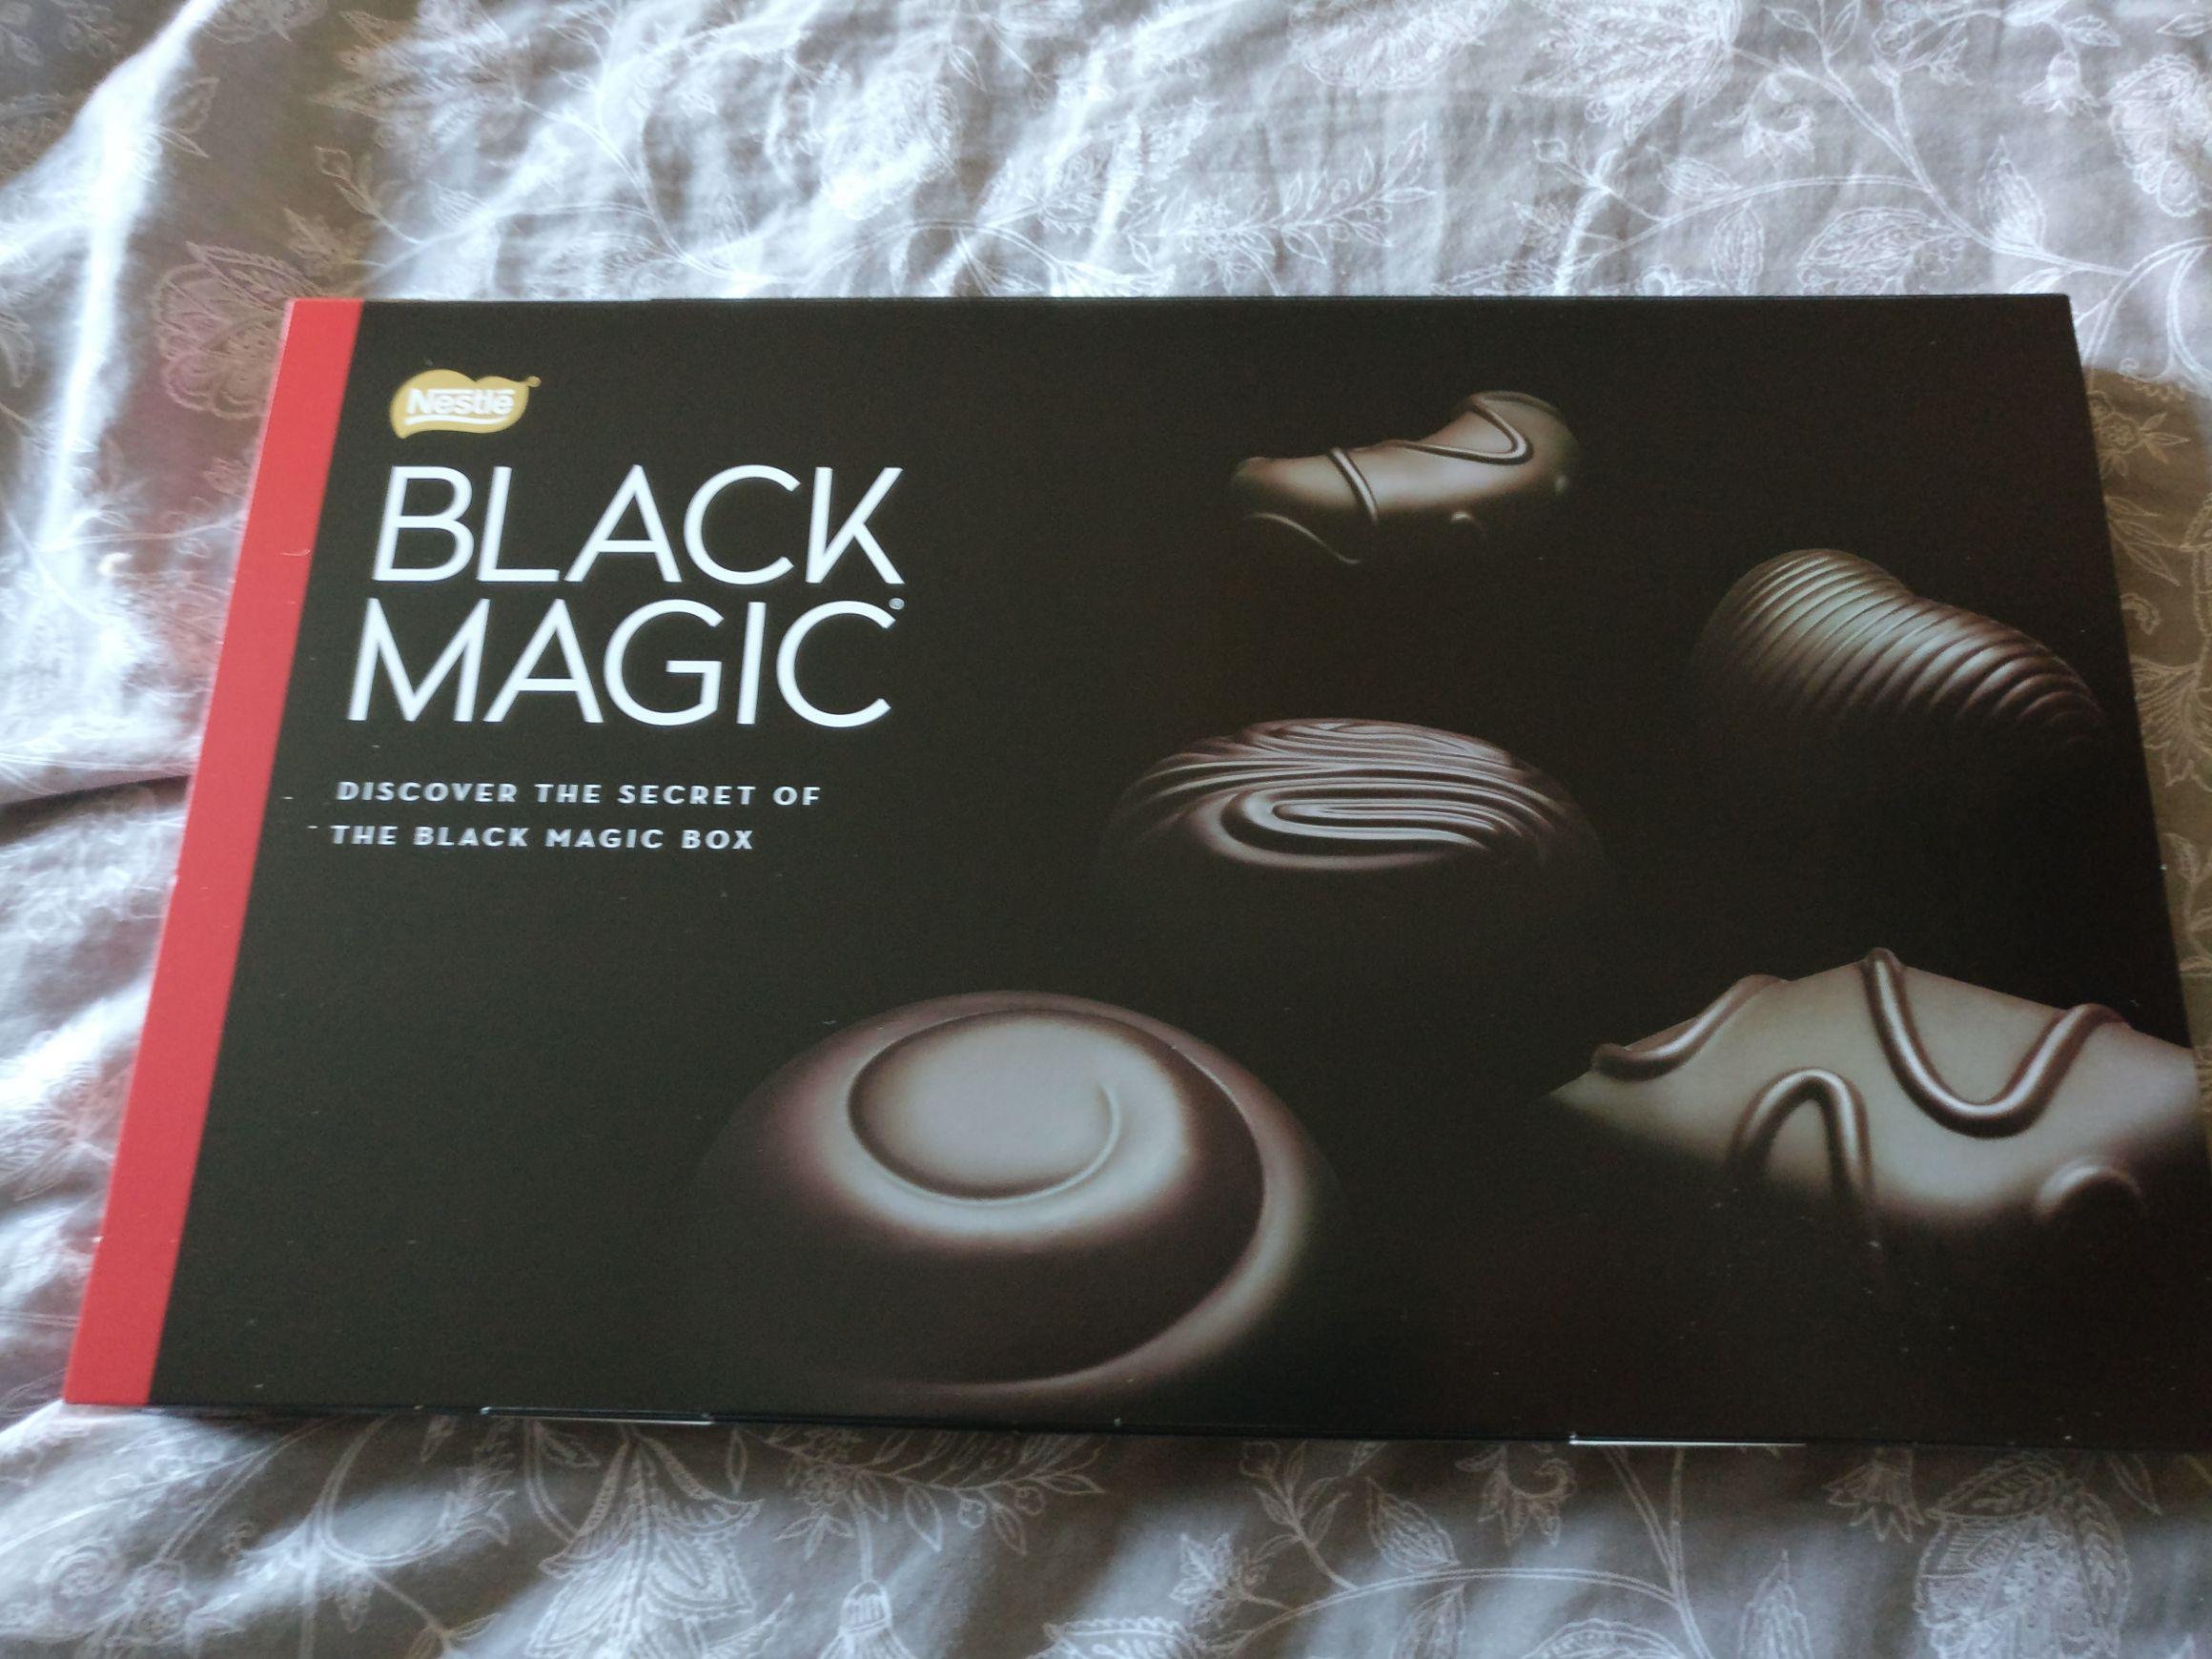 Large box of Black Magic 443g instore reduction £2.50 at Morrison's - Kirkstall